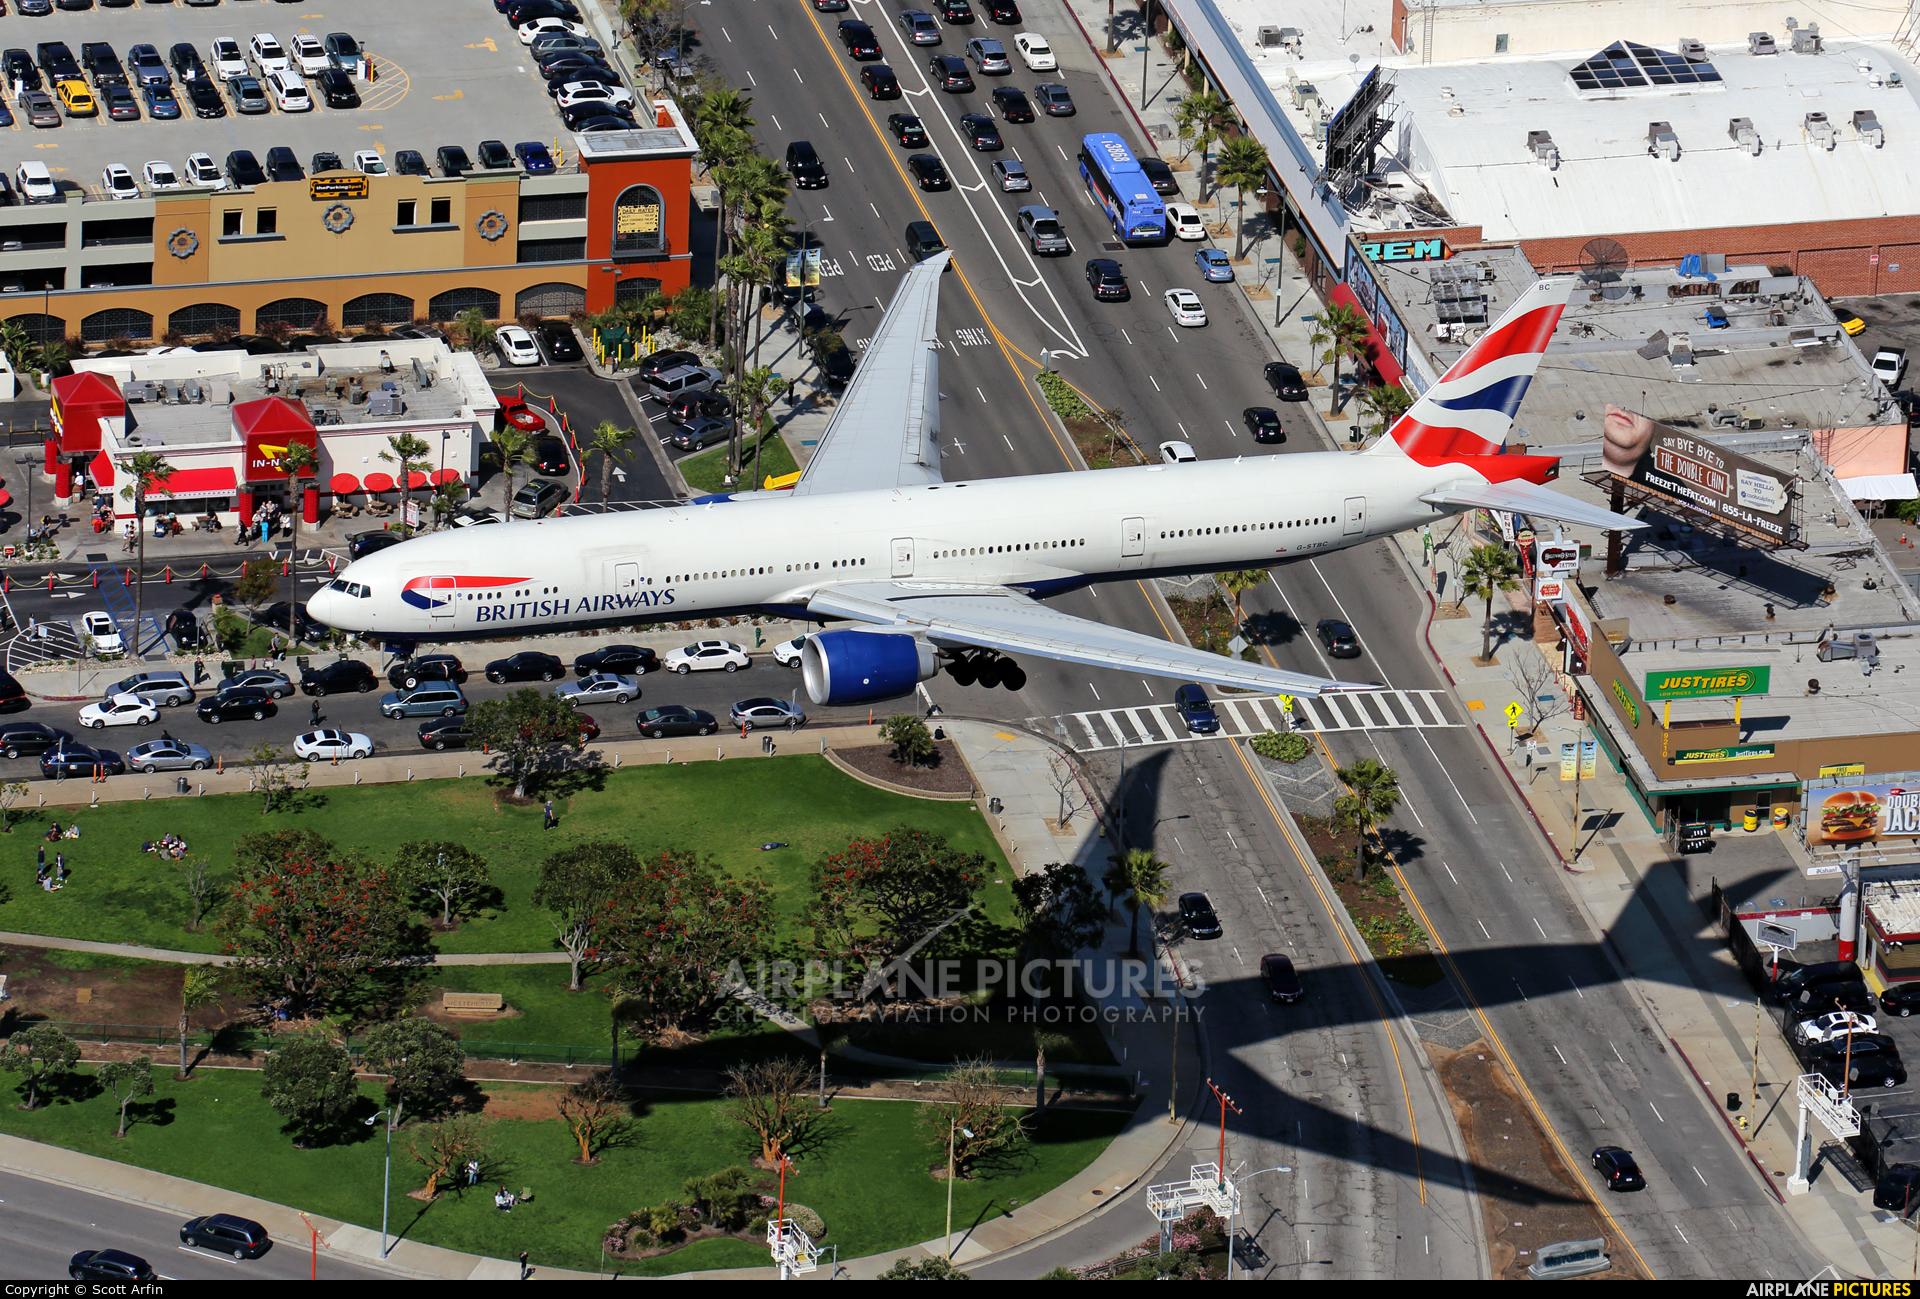 British Airways G-STBC aircraft at Los Angeles Intl